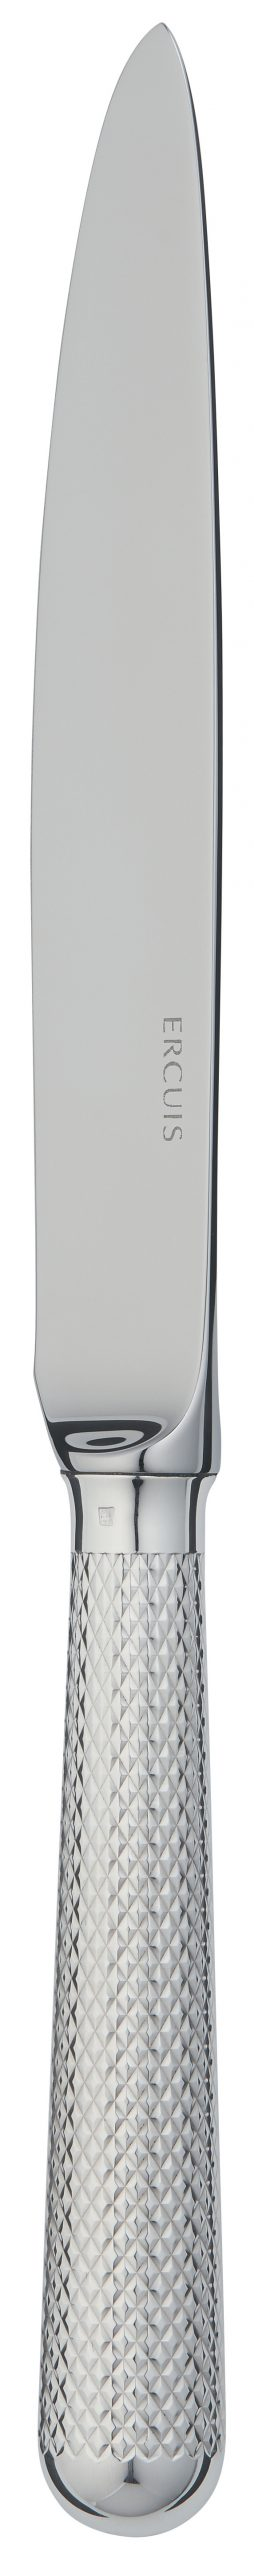 F654680-03 – 1 – Diamant – Dinner knife – Ercuis